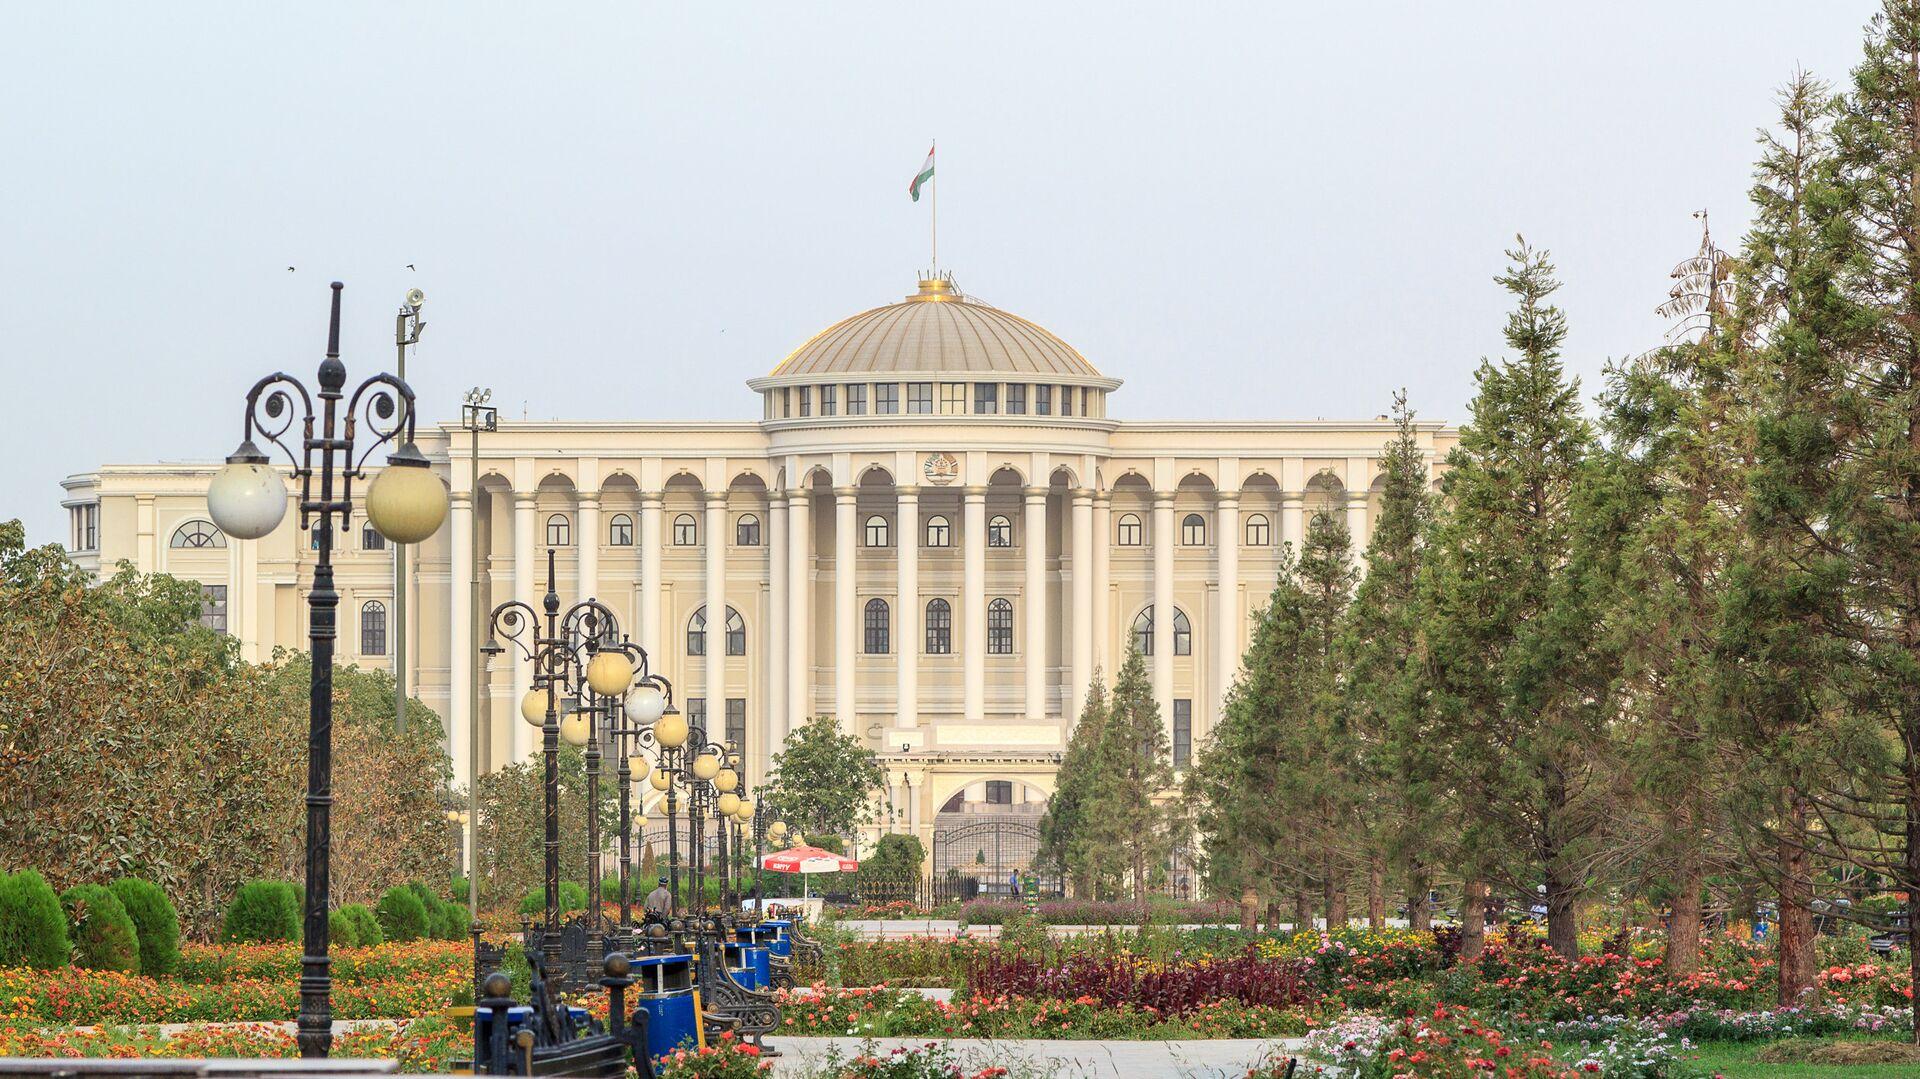 Дворец нации в Душанбе, Таджикистан - РИА Новости, 1920, 04.05.2021